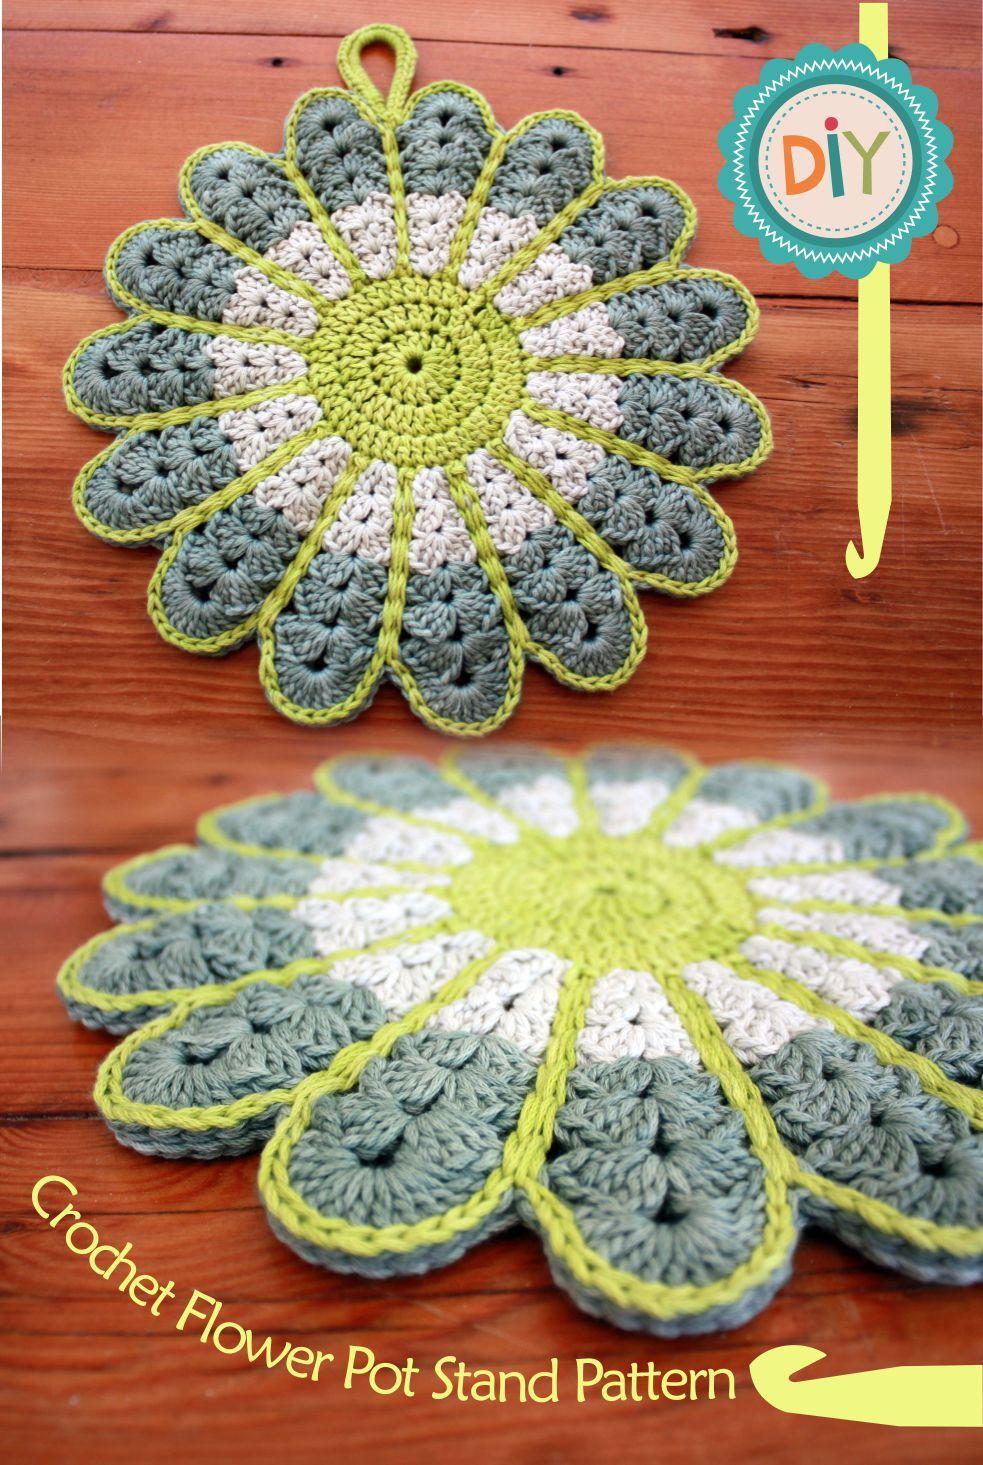 Colorful Crochet Flower Pot Holder with FREE Pattern | crochet ...